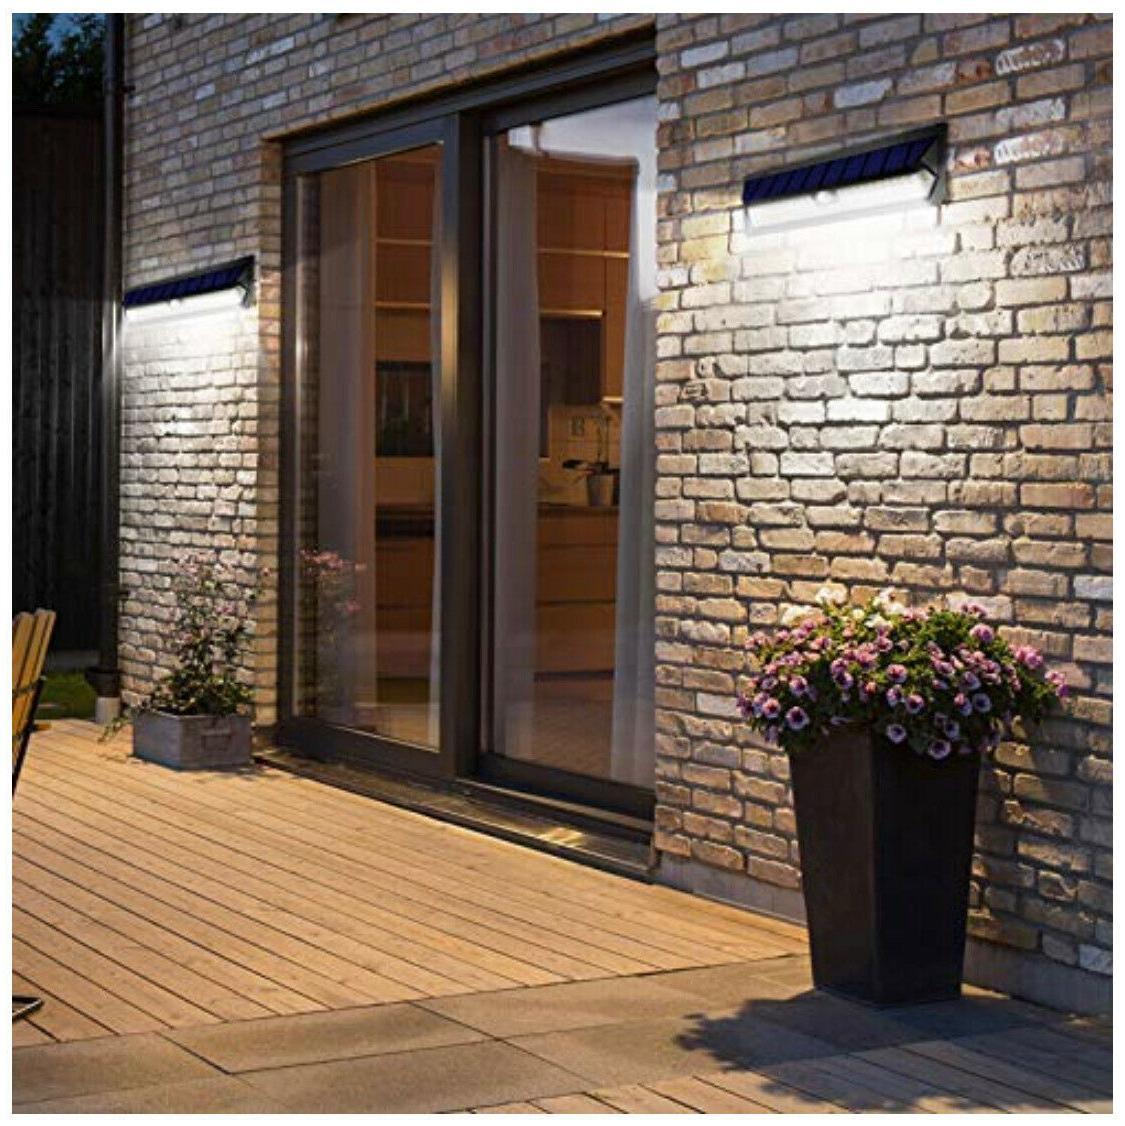 Amir Lights Outdoor Wall Waterproof